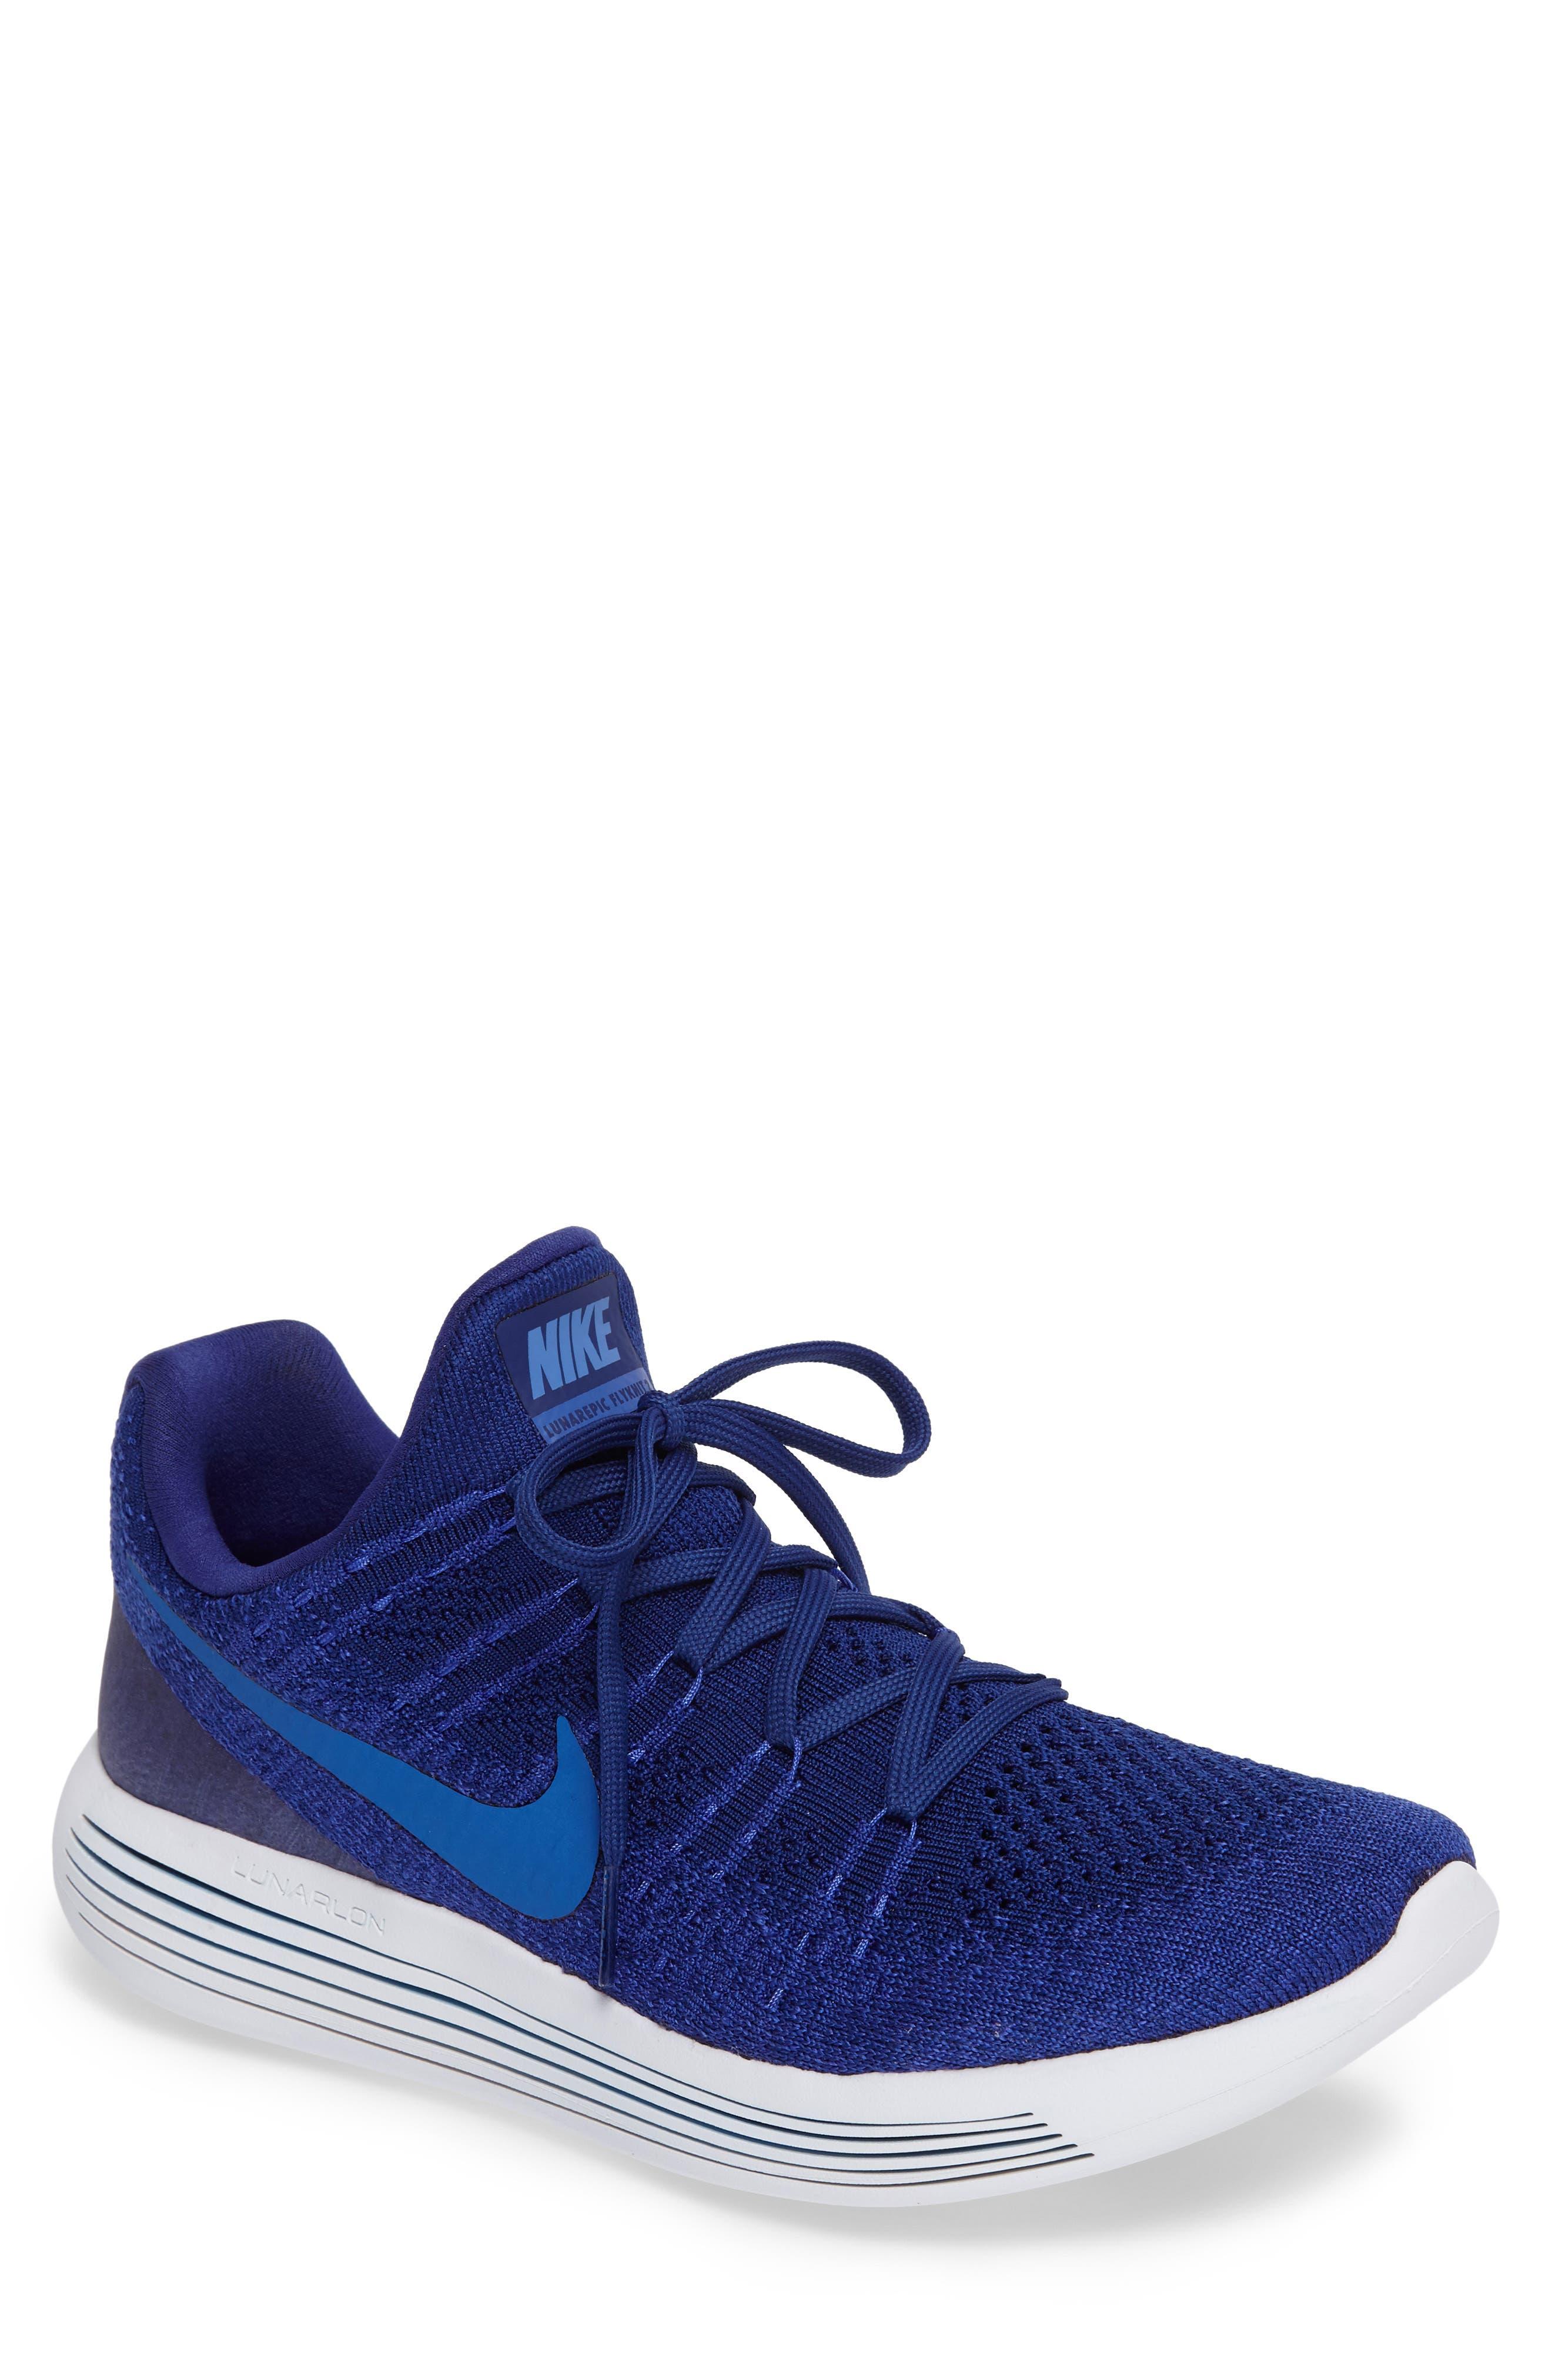 Flyknit 2 LunarEpic Running Shoe,                         Main,                         color, Royal Blue/ Blue